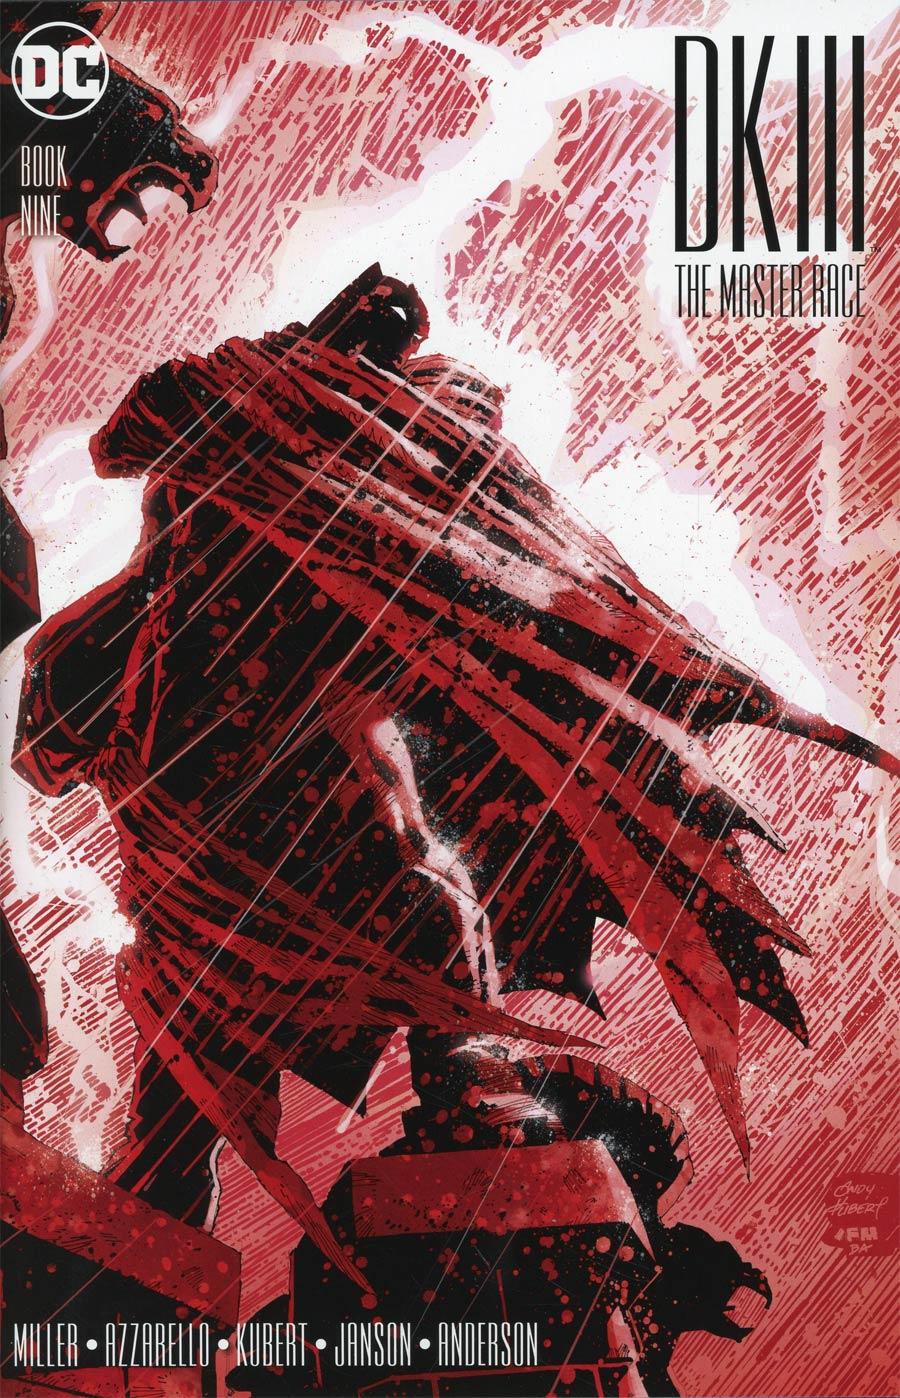 Dark Knight III The Master Race #9 Cover A Regular Andy Kubert Batman Cover